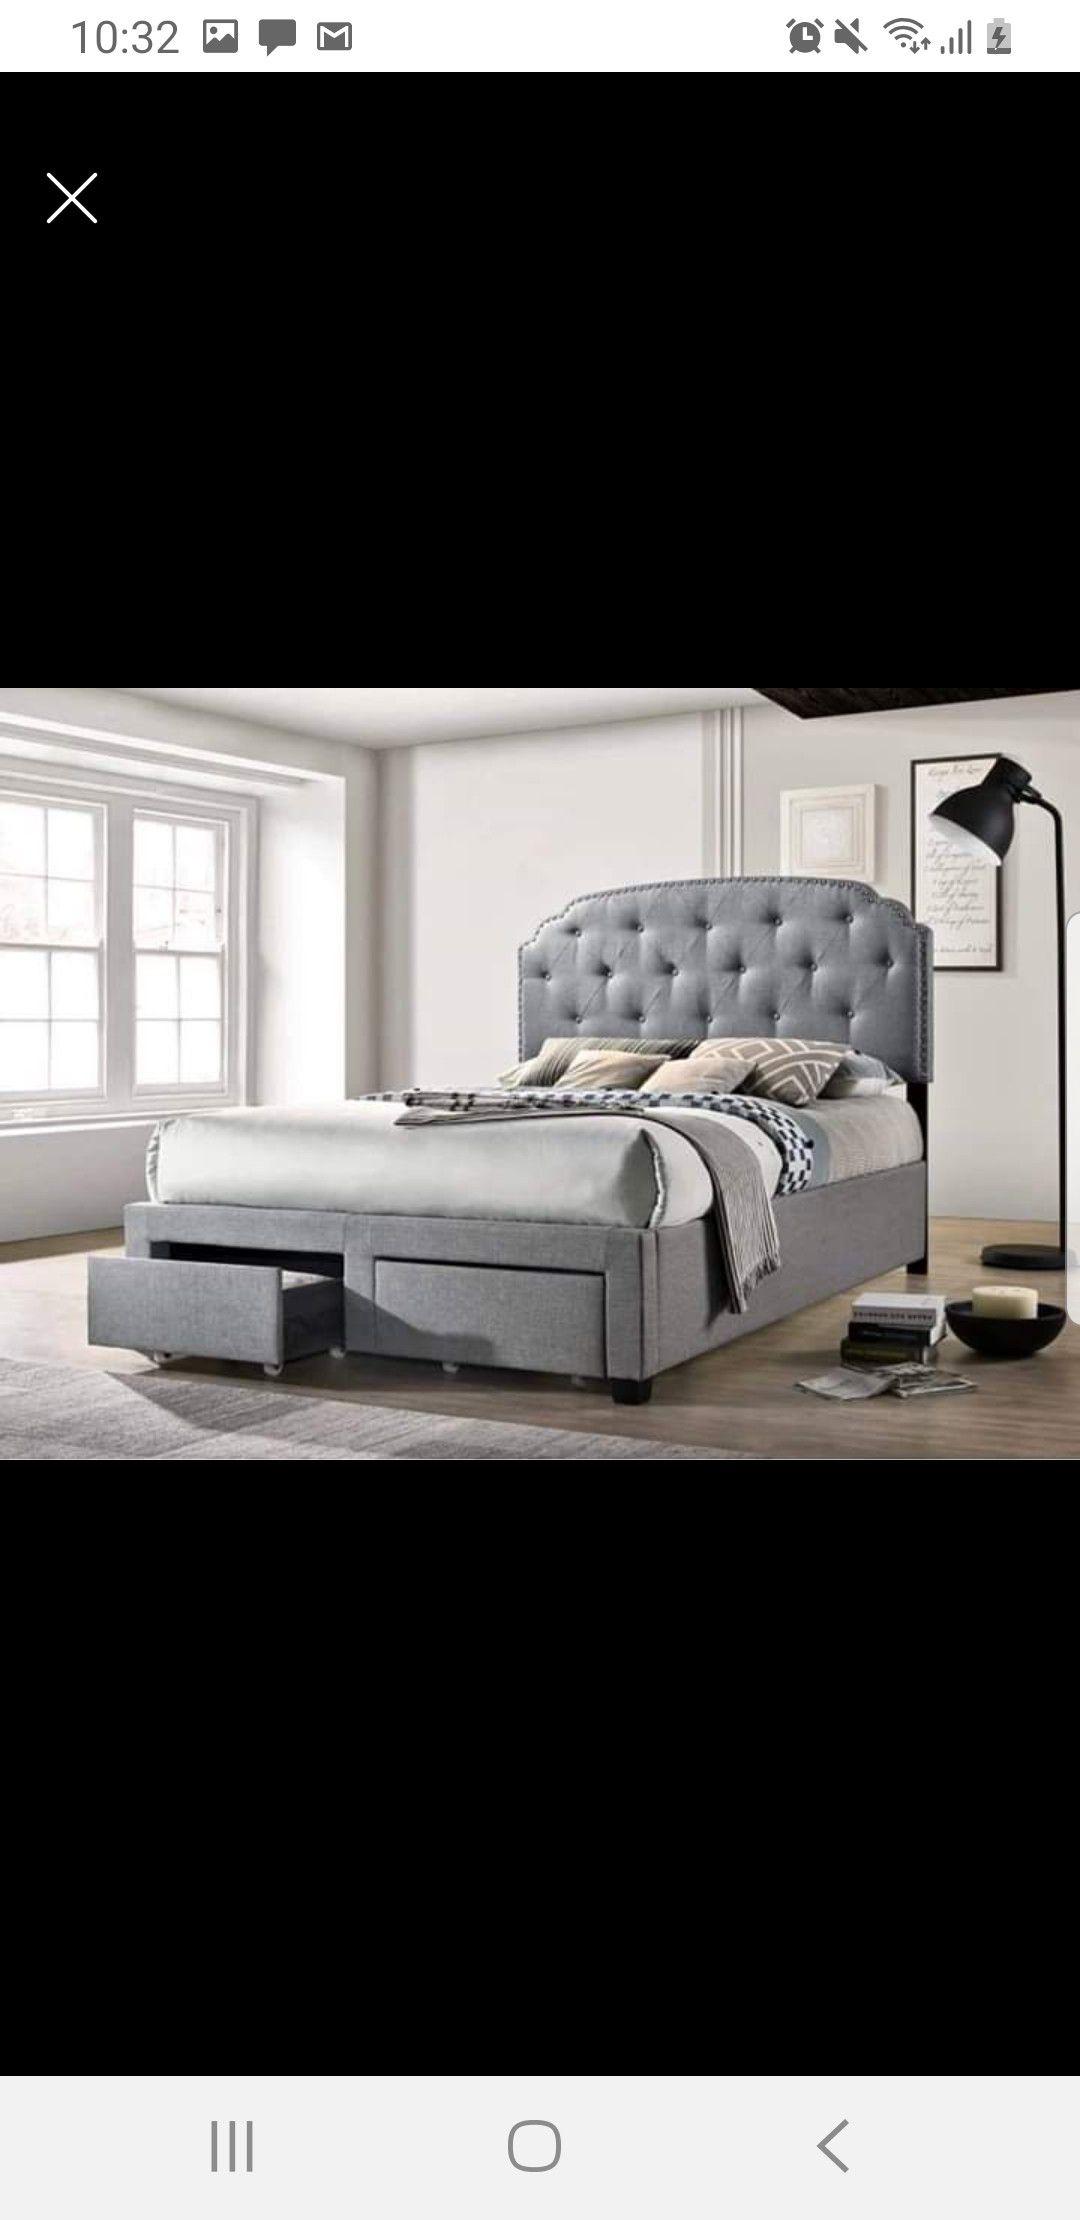 New Grey Queen Size Bed